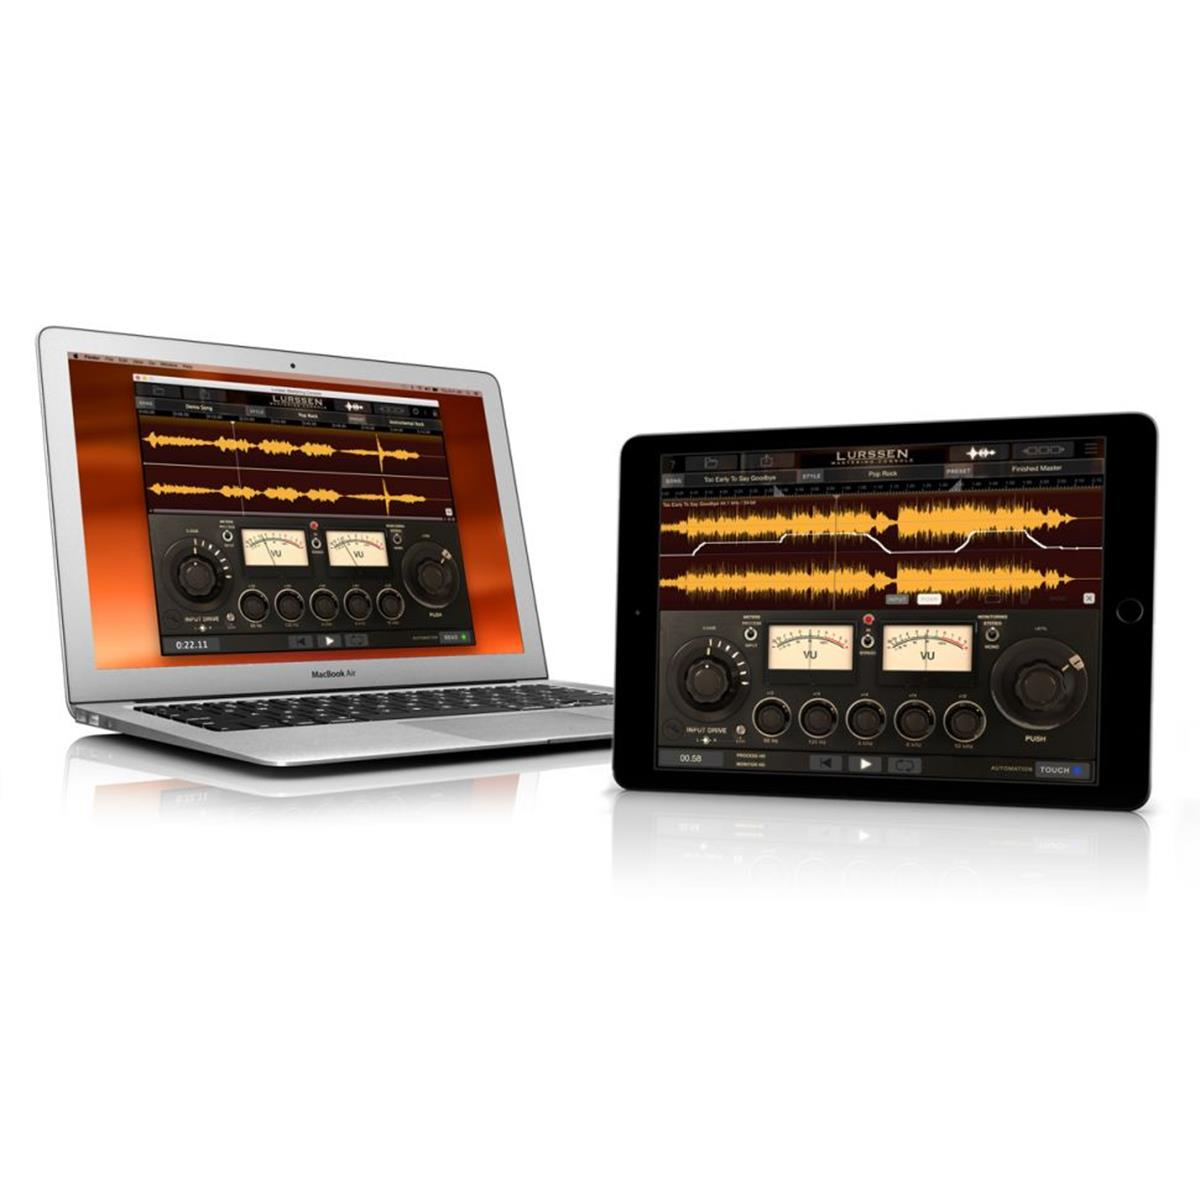 IK Multimedia Lurssen Mastering Console -app per iPhone/iPad e Mac/PC